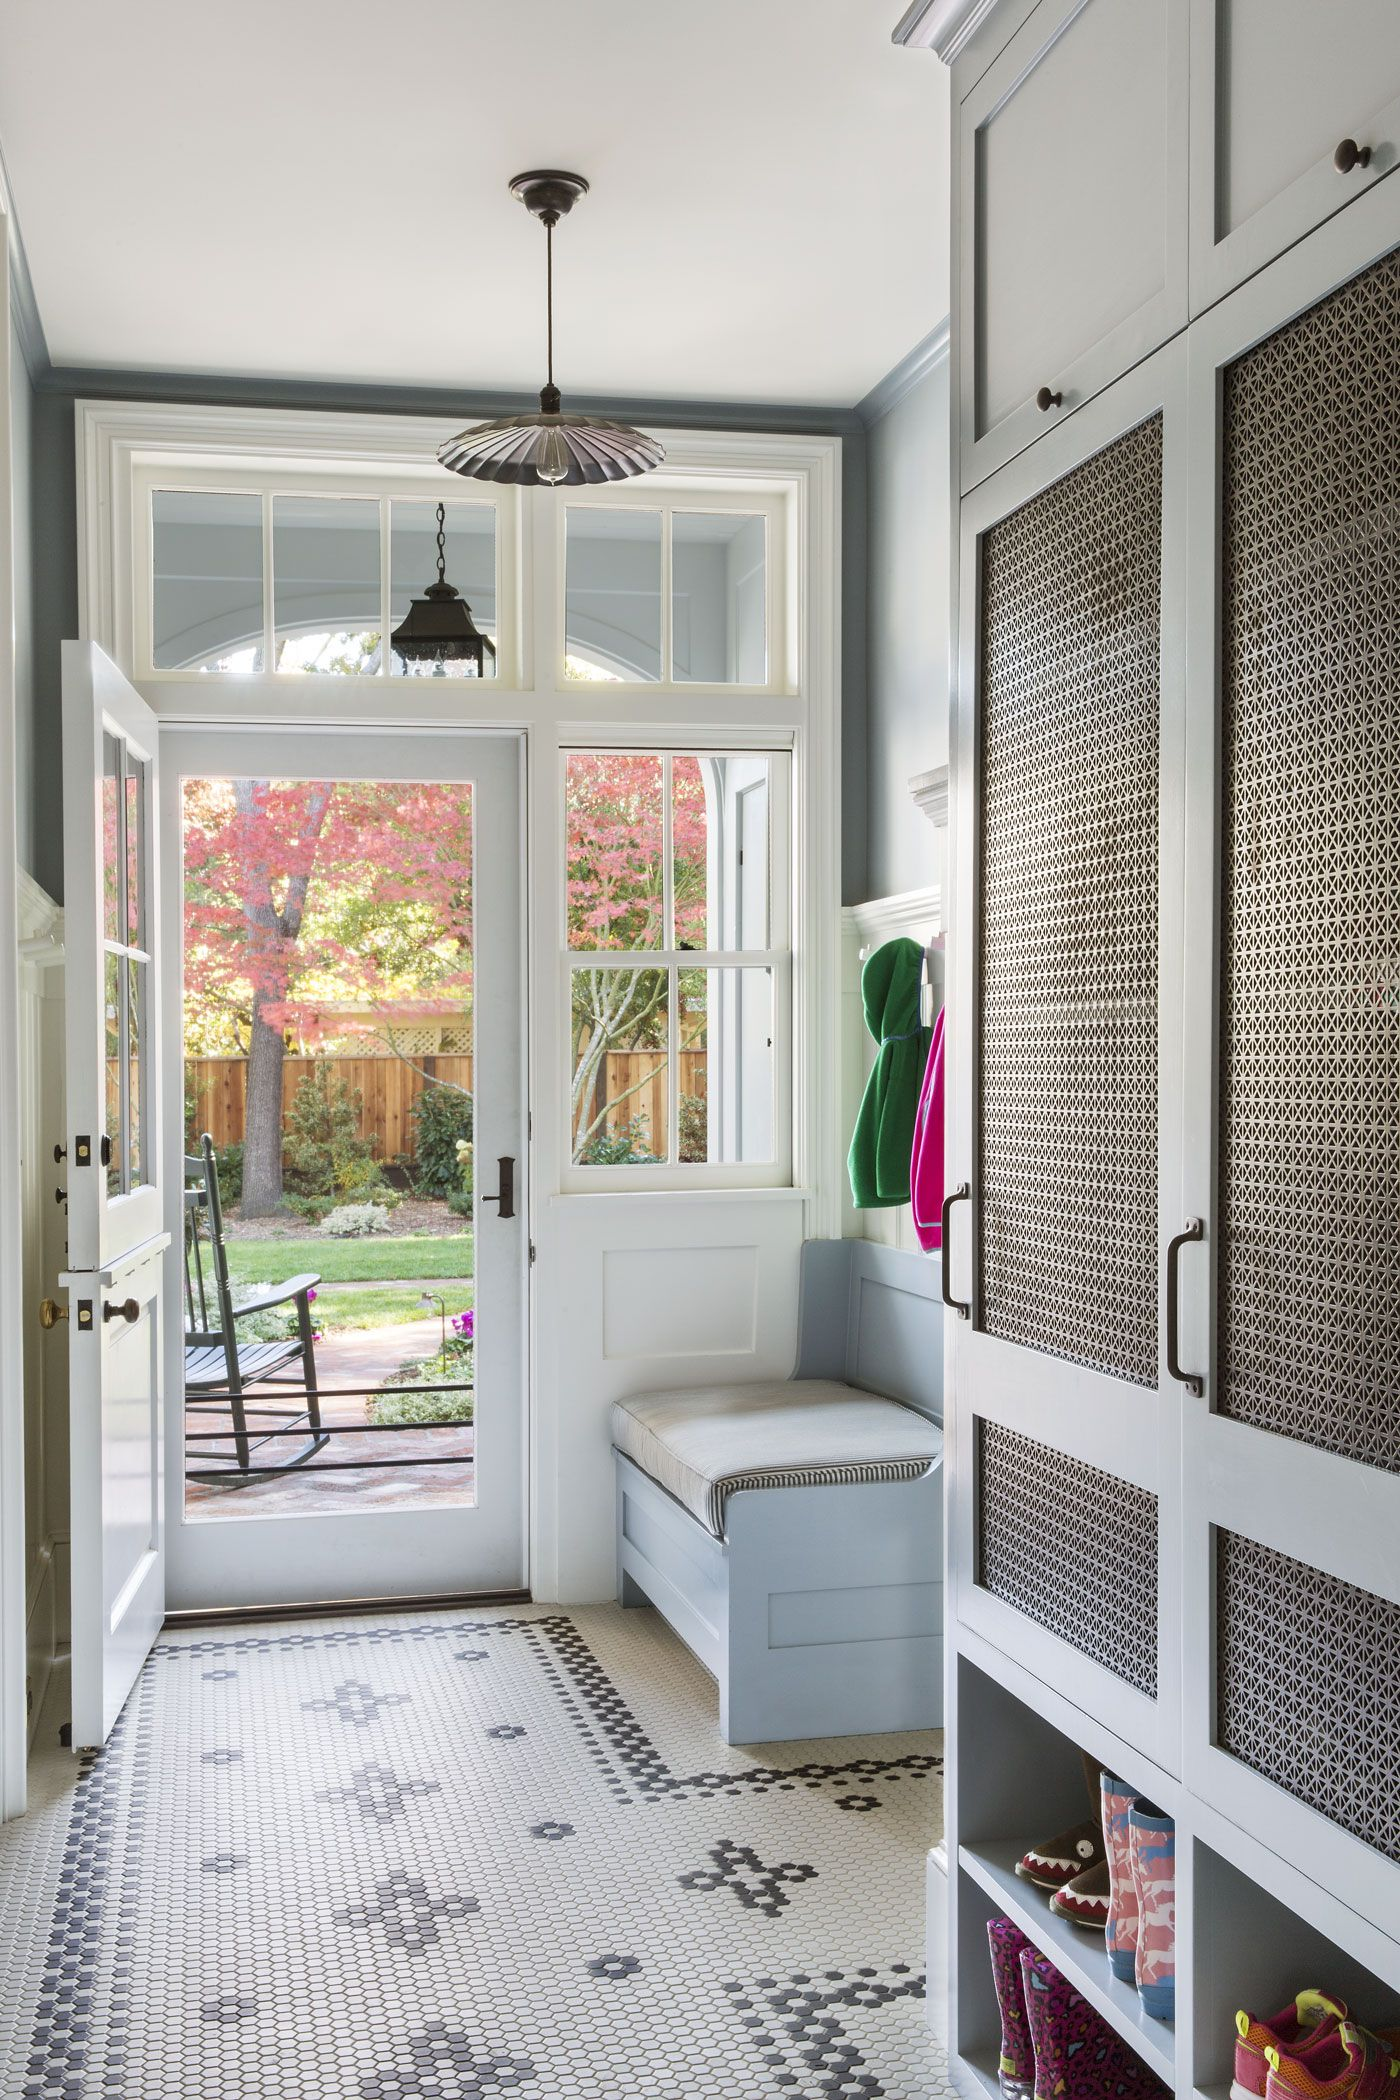 Dutch Door with Transom Windows